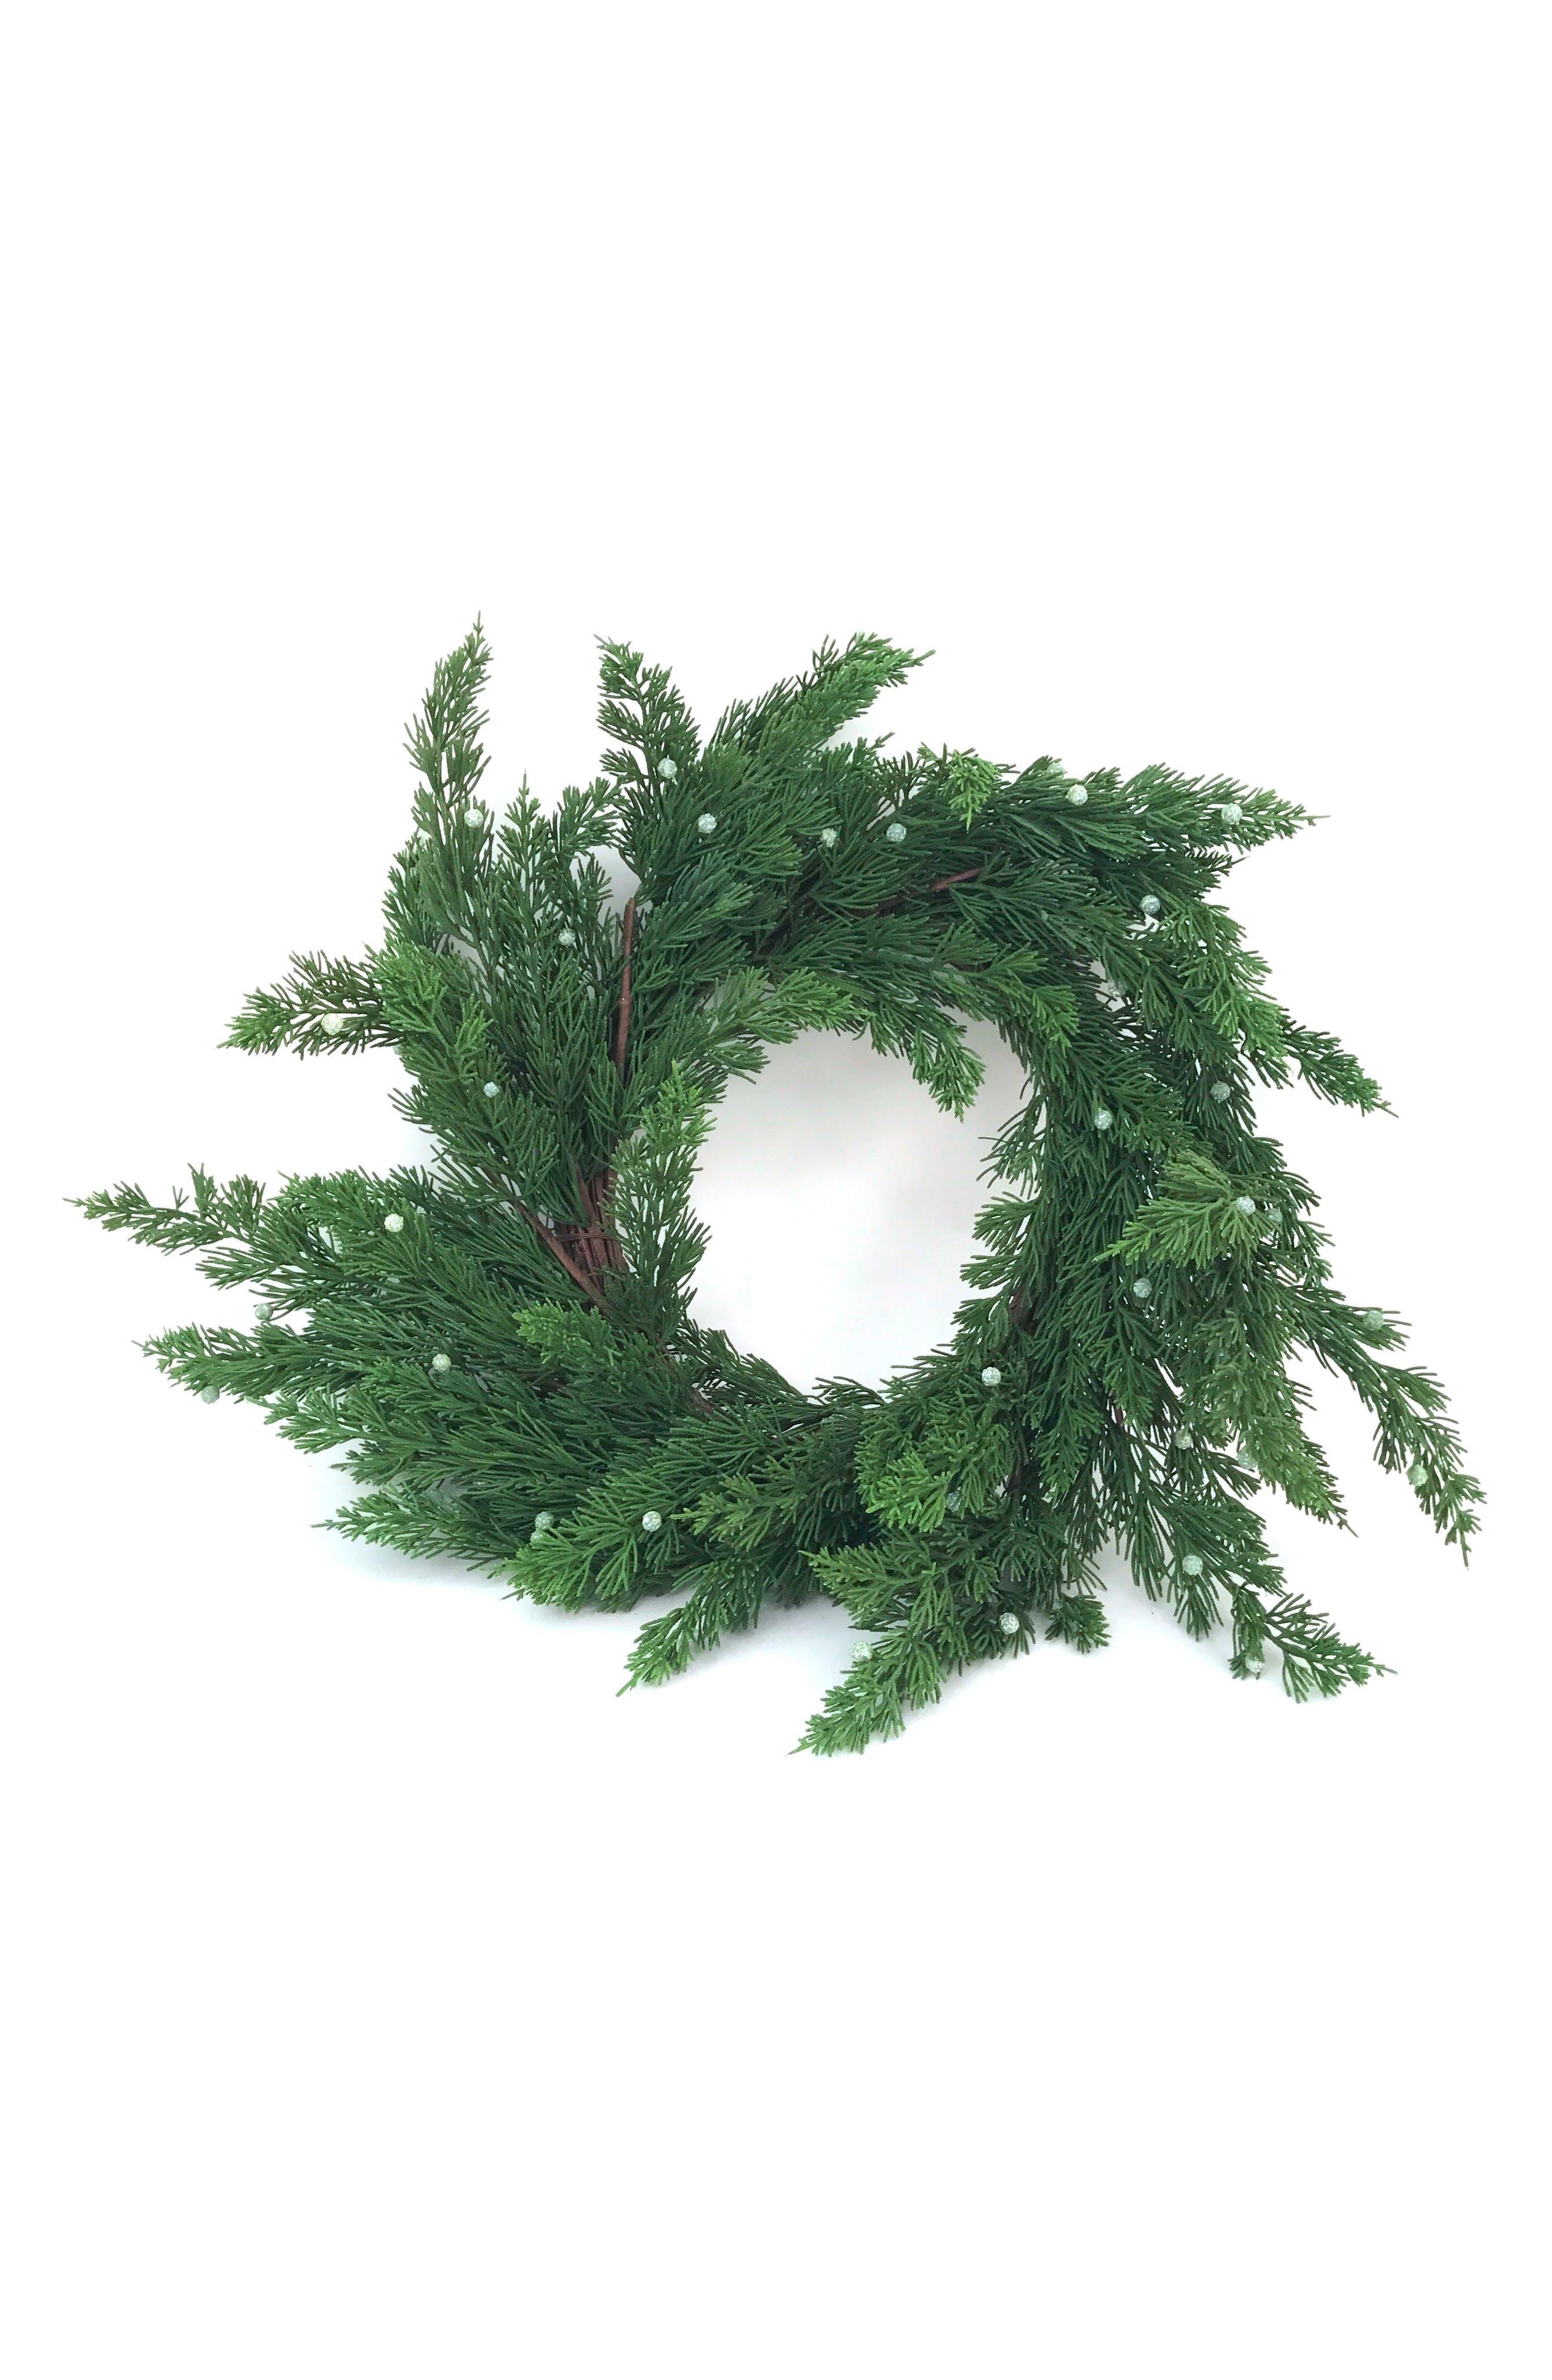 Main Image - Arty Pine Wreath with Juniper Berries